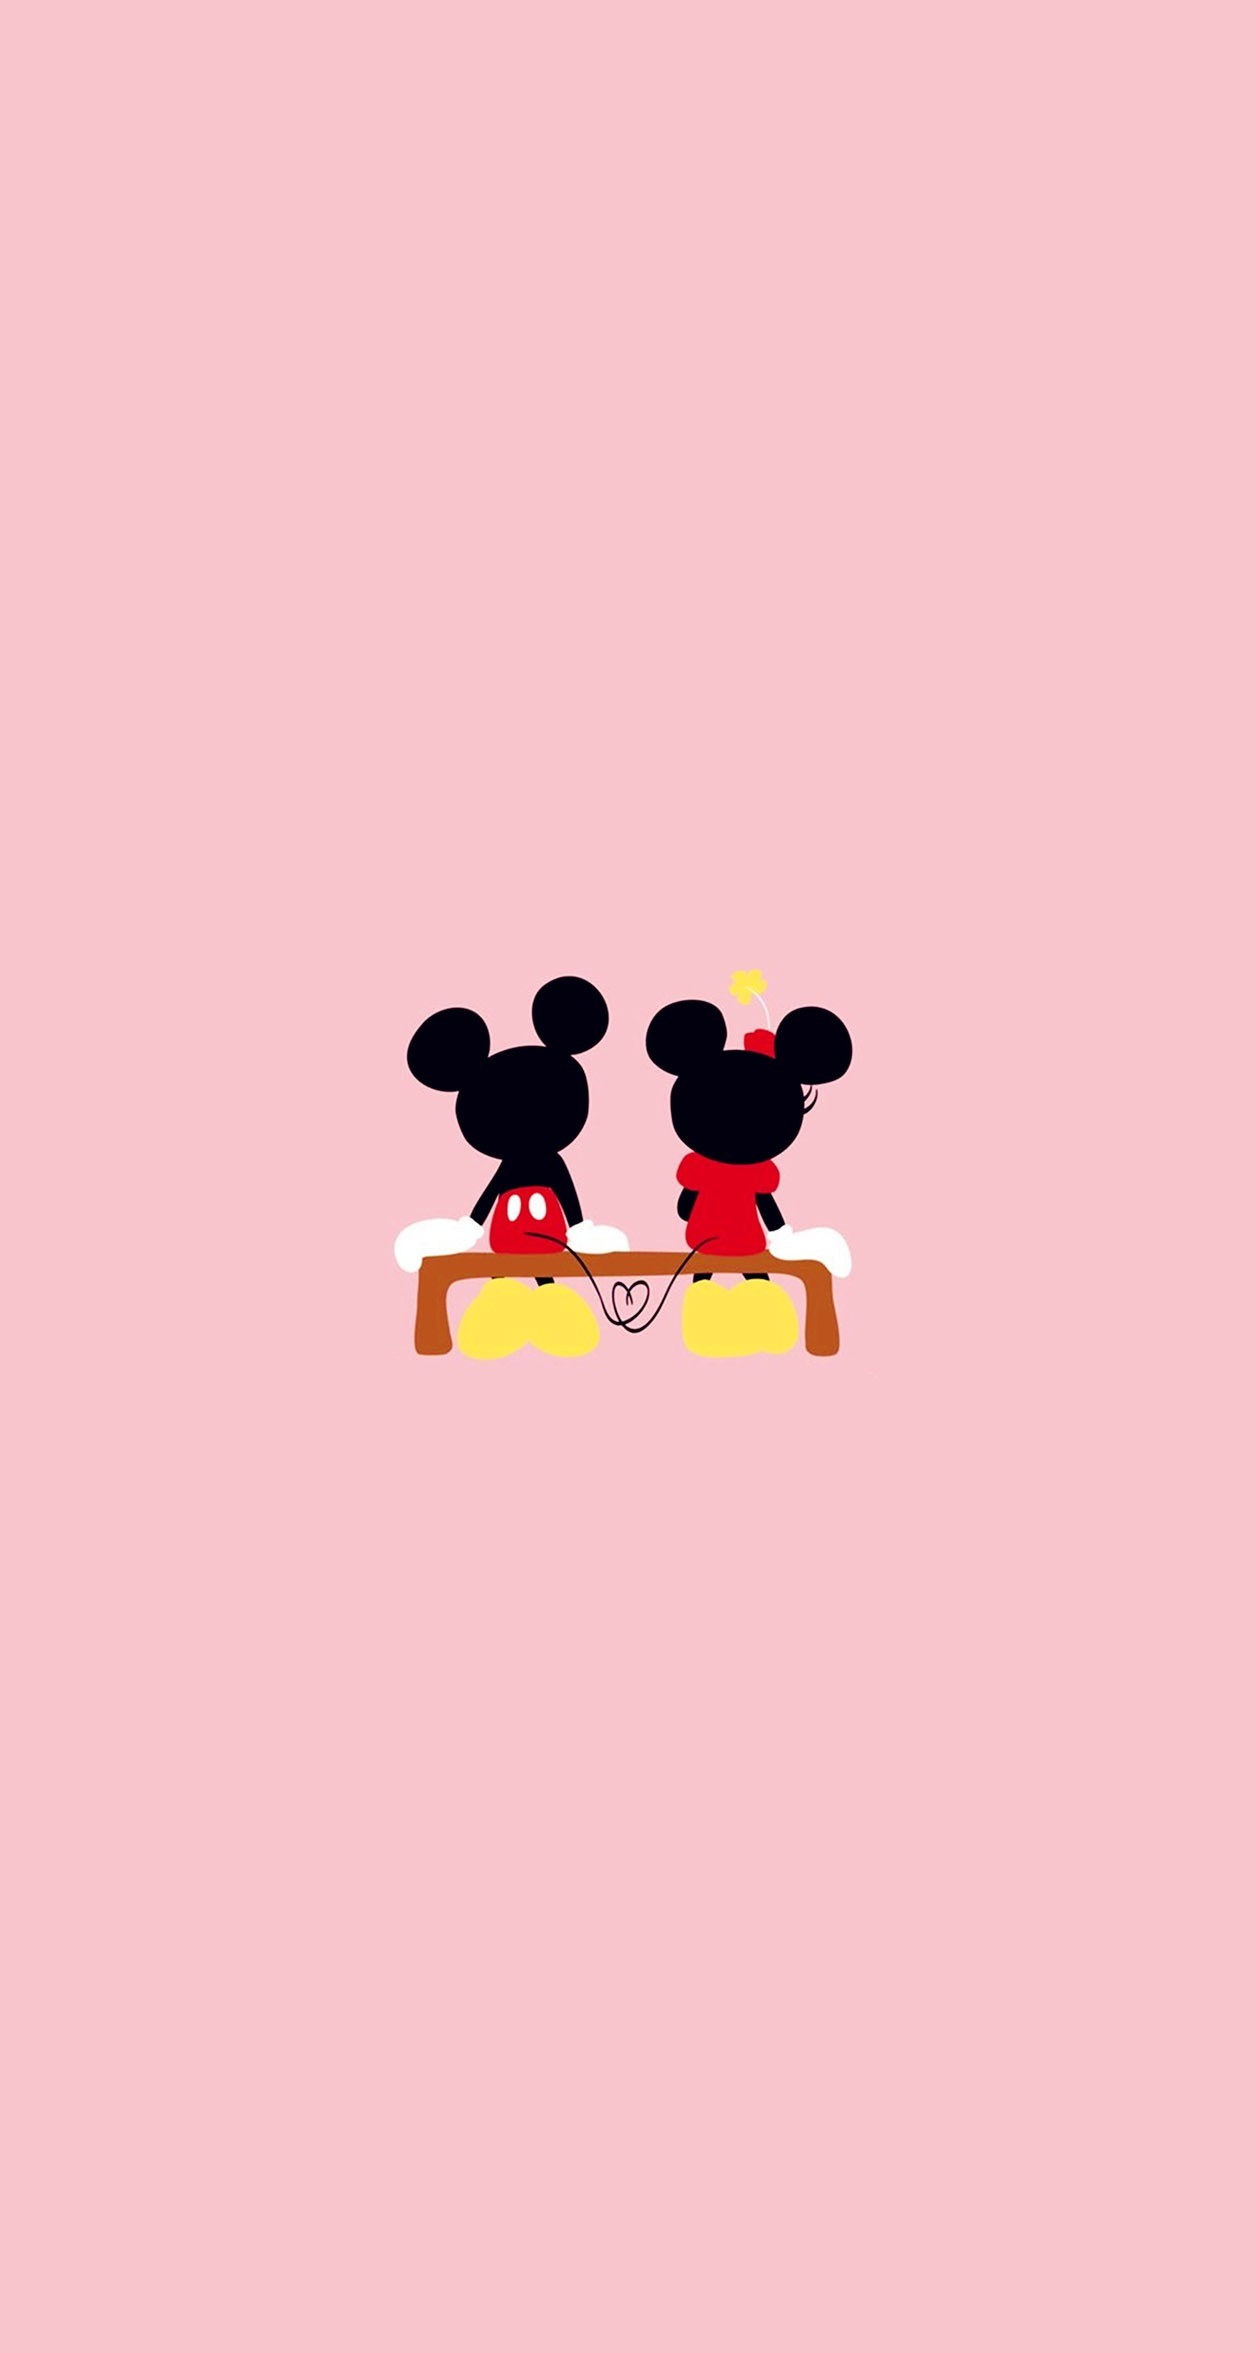 Disney Mouse, Walt Disney, Pretty Wallpapers, Iphone Wallpapers, Iphone  Backgrounds, Cellphone Wallpaper, Disney Wallpaper, Valentines Day, Emojis